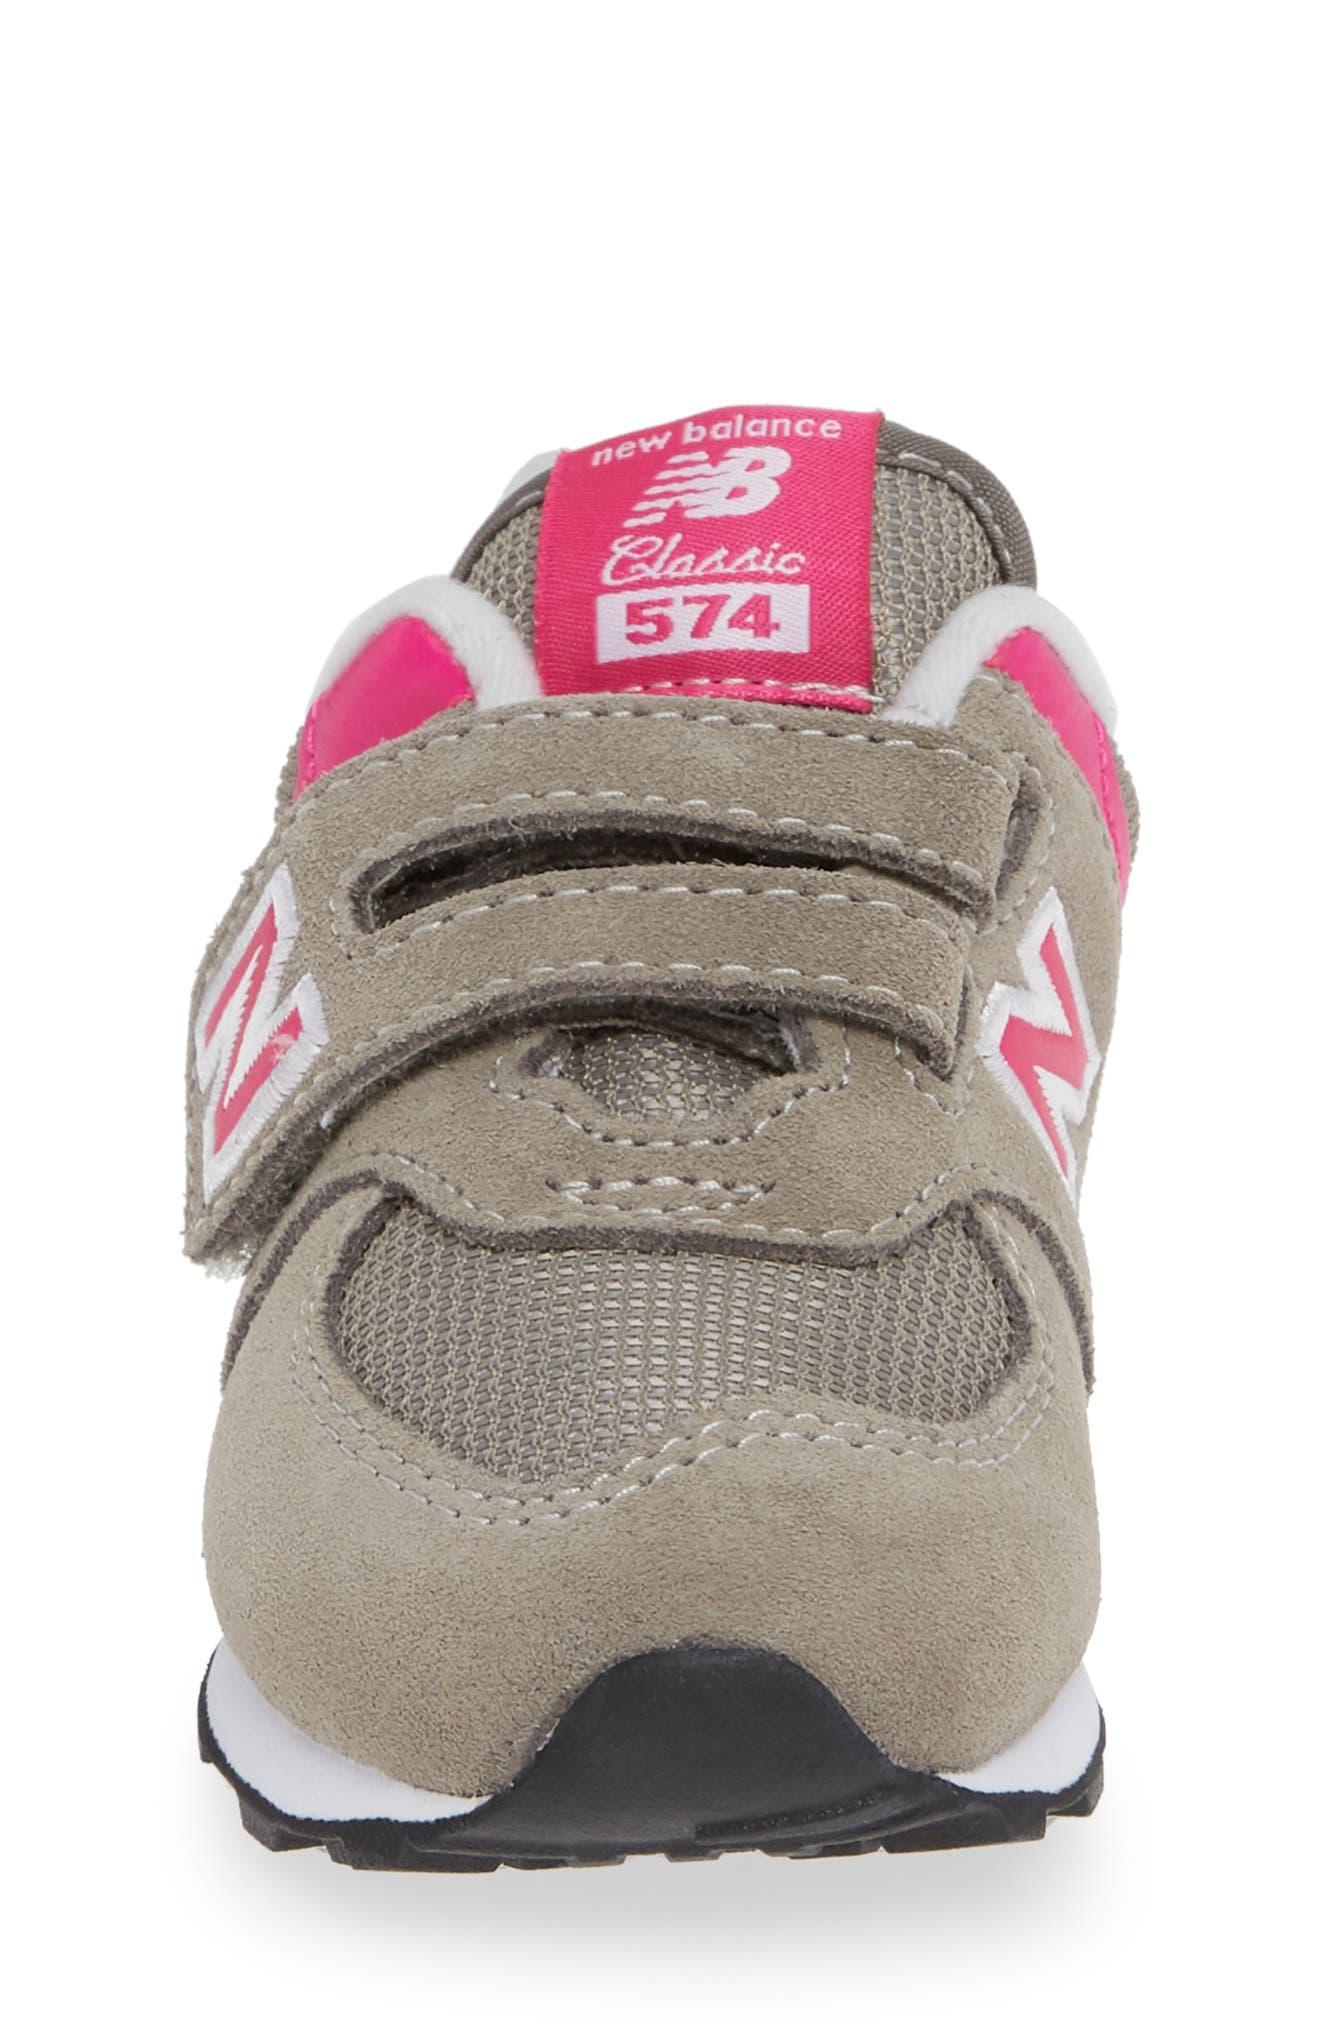 NEW BALANCE, '574 Core' Sneaker, Alternate thumbnail 4, color, GREY/ PINK